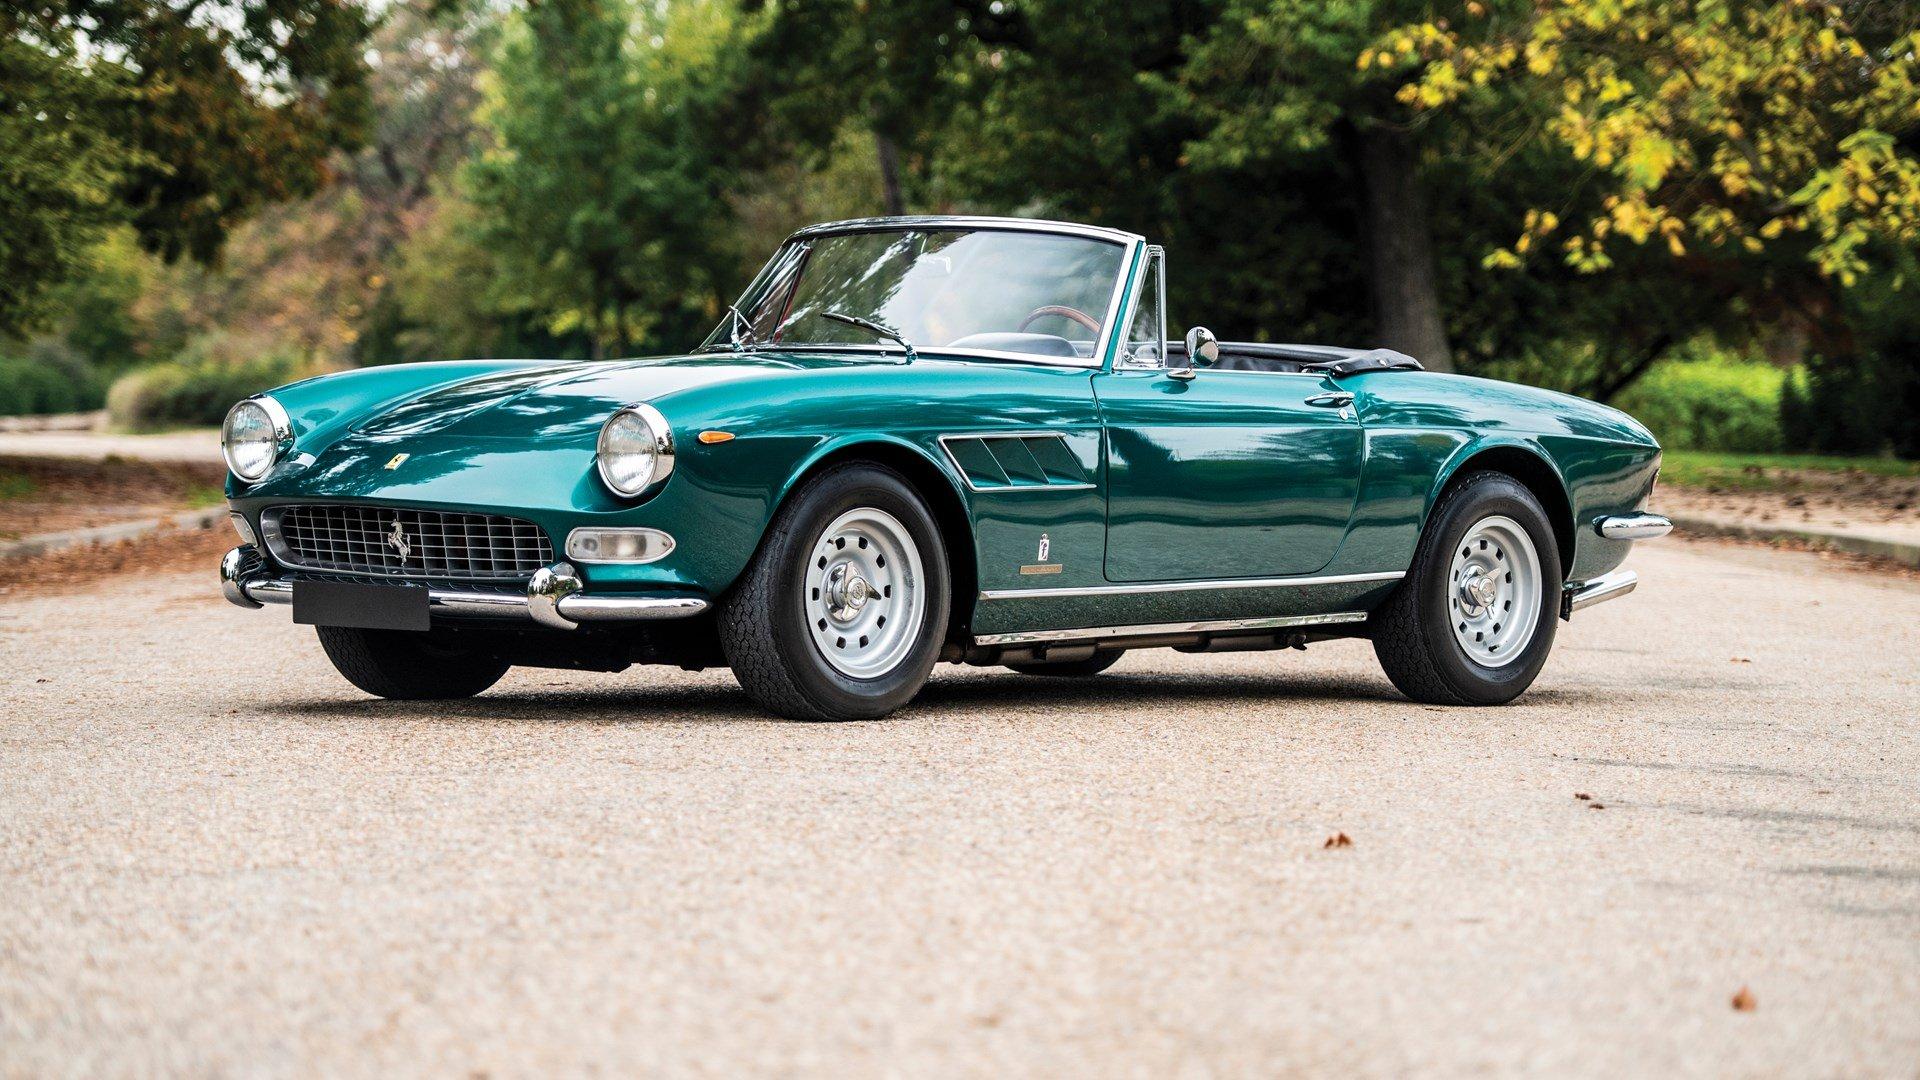 1965 Ferrari 275 Gts Oldtimer Zu Verkaufen